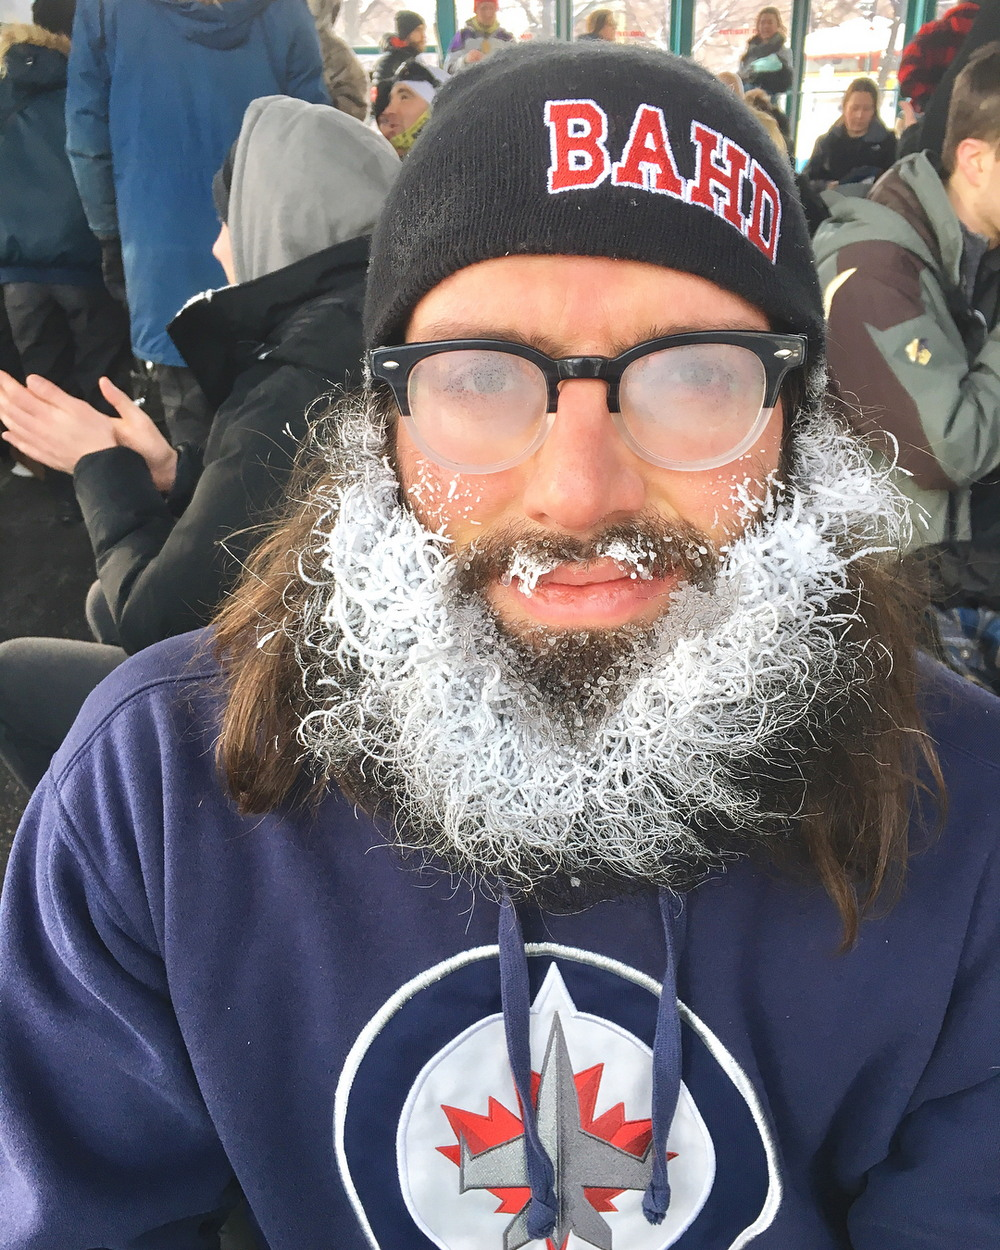 barba-helada